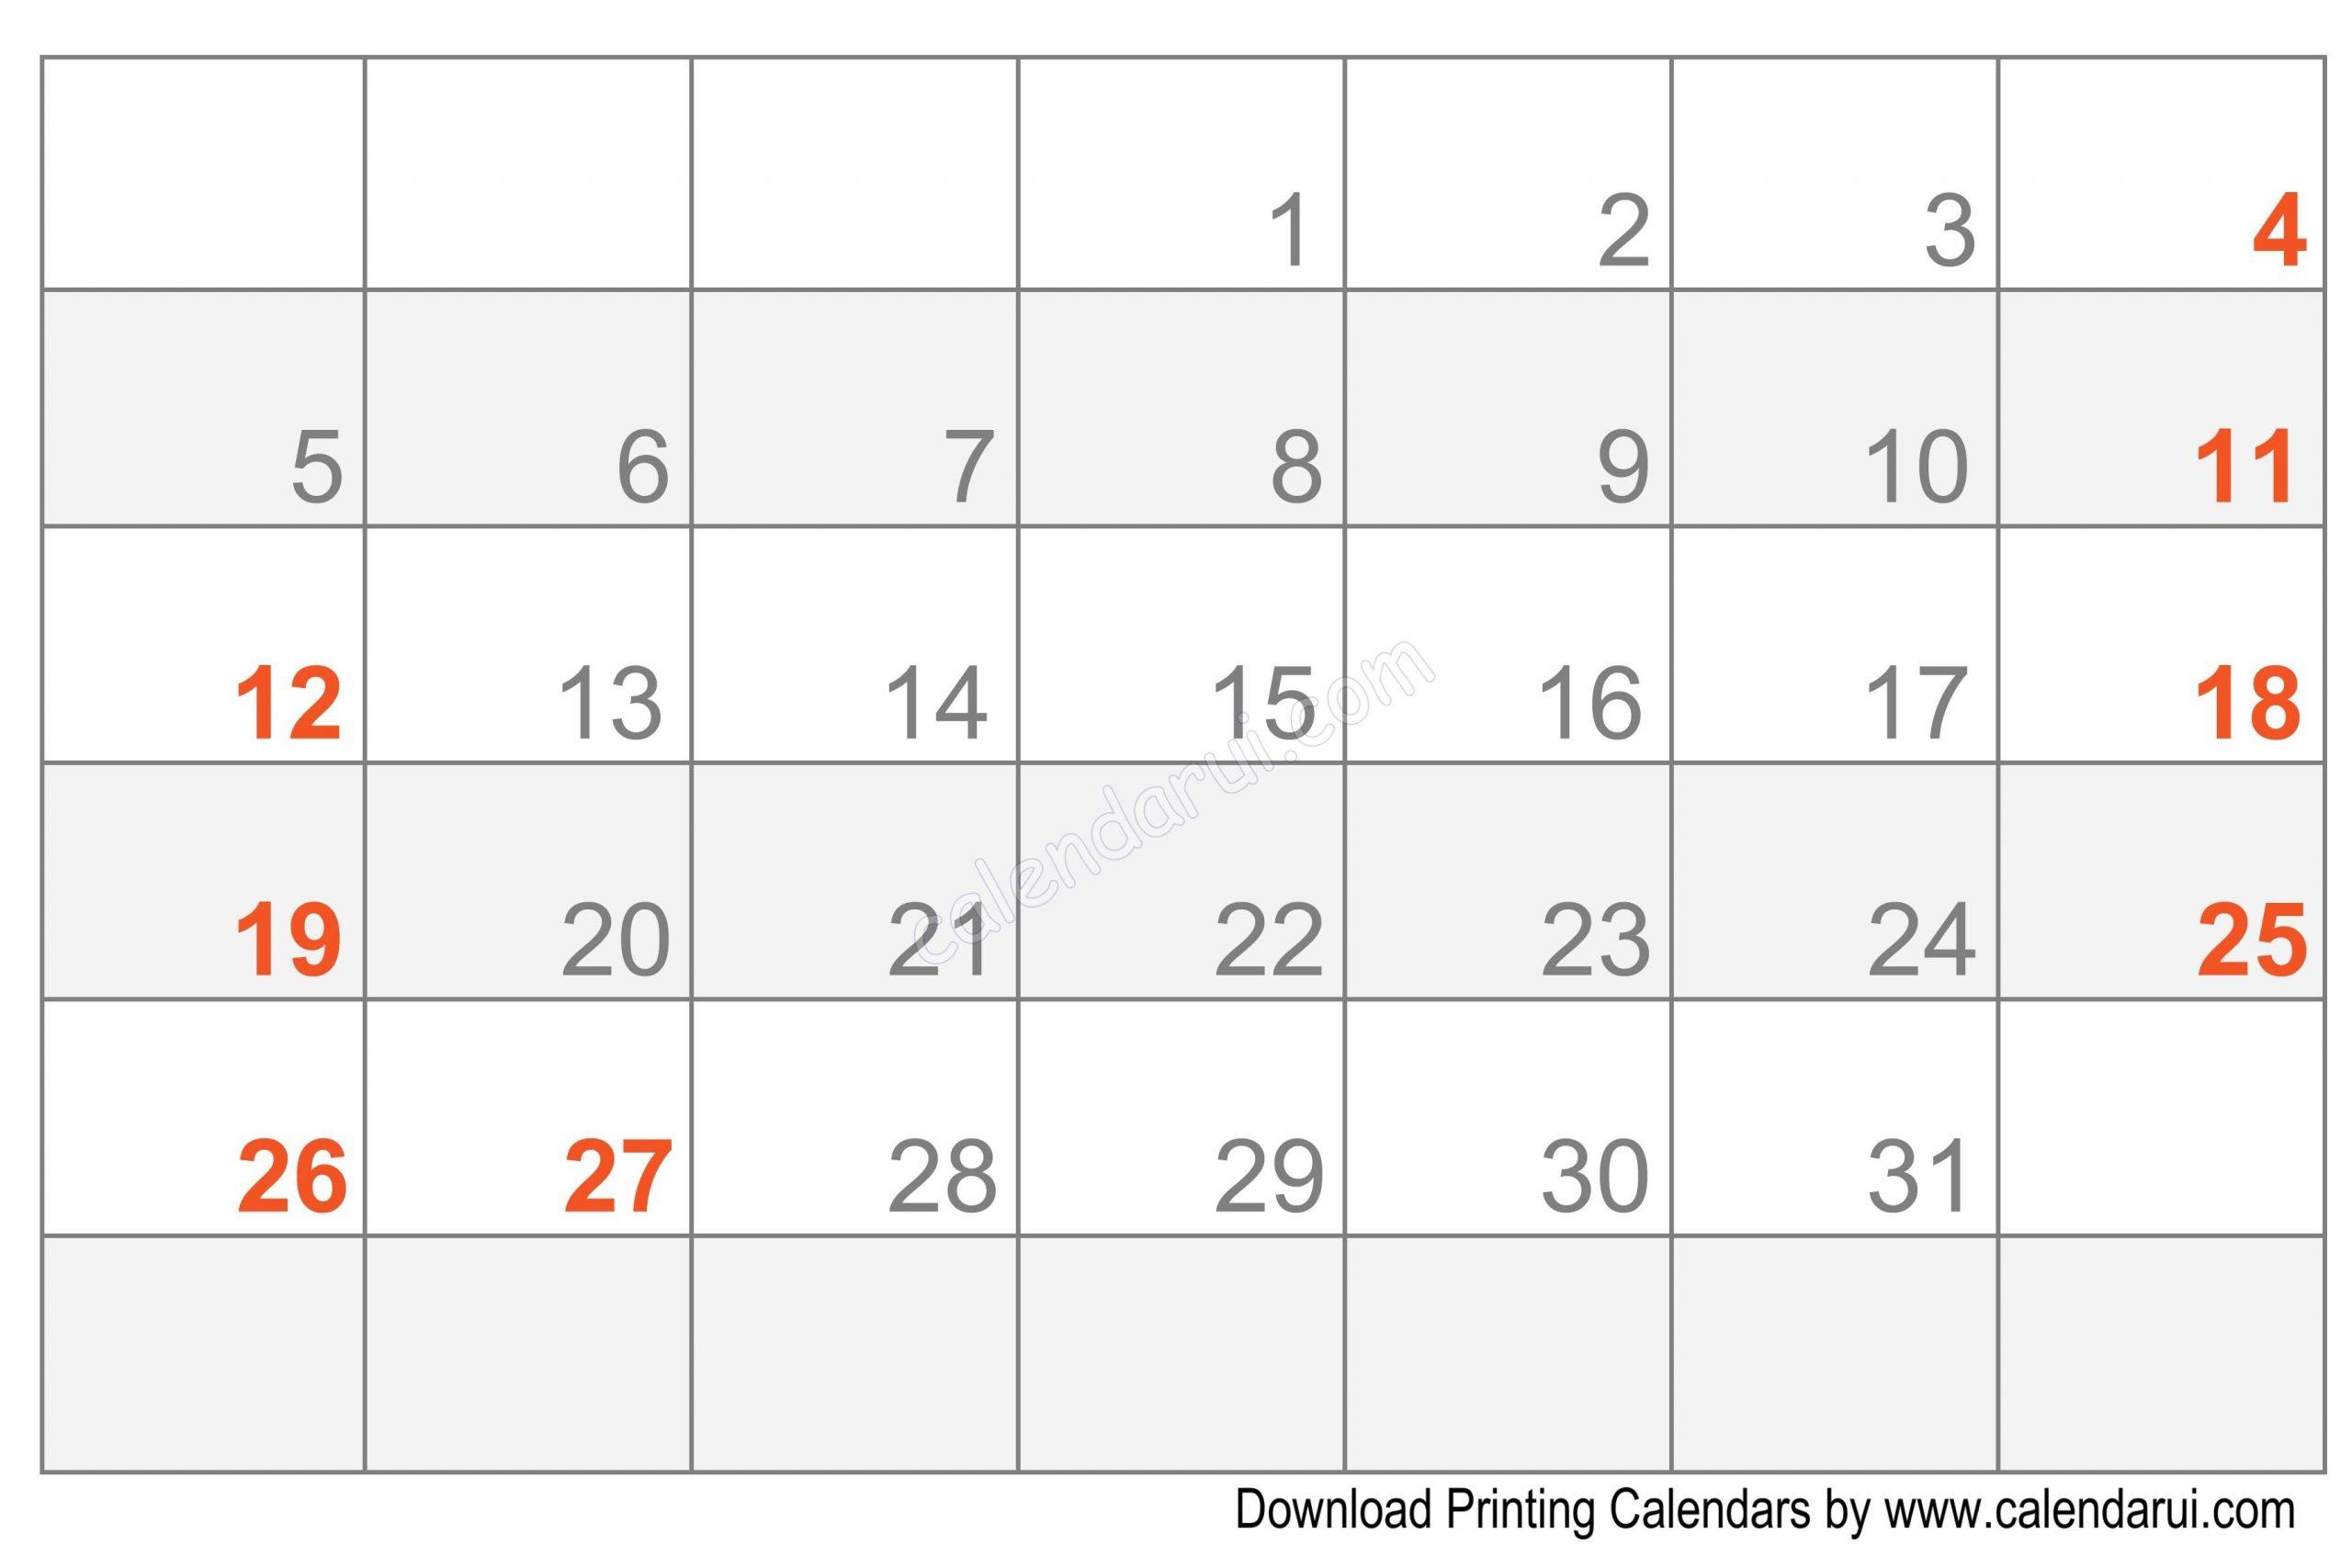 Printable Blank Calendar Template Free | Calendar Template Online Calendar Fill In